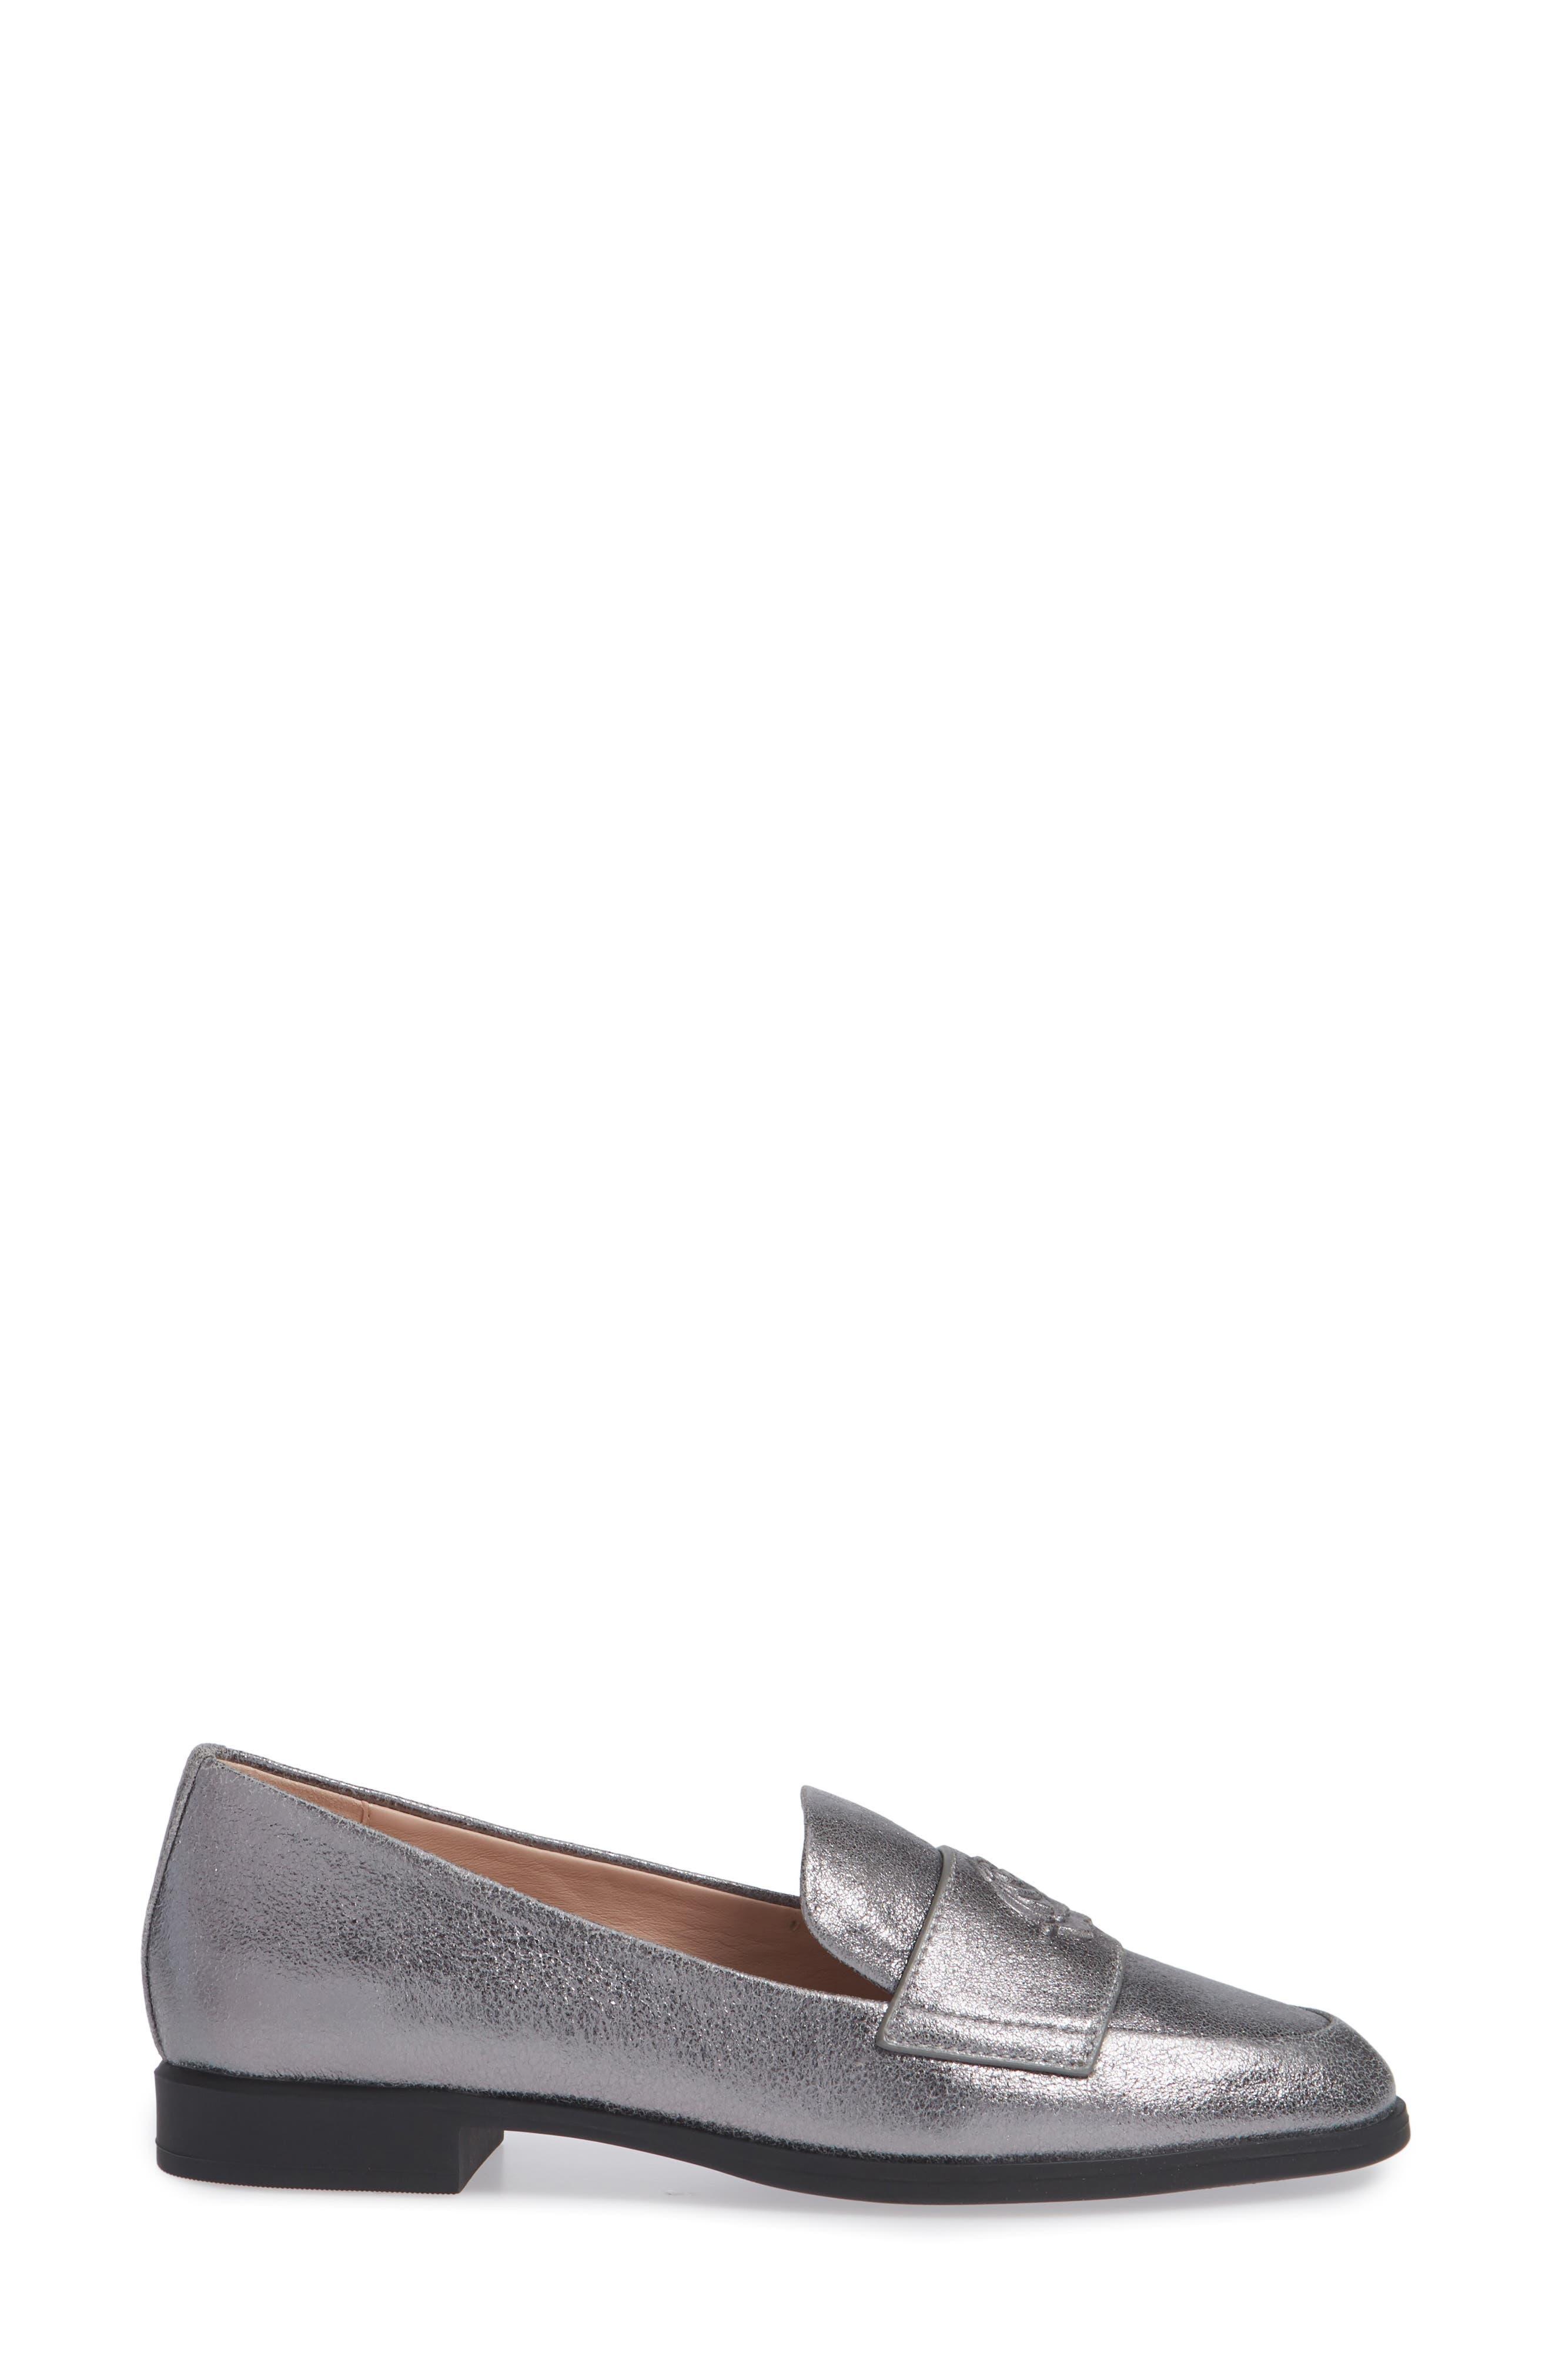 Blossom Loafer,                             Alternate thumbnail 3, color,                             GUNMETAL LEATHER